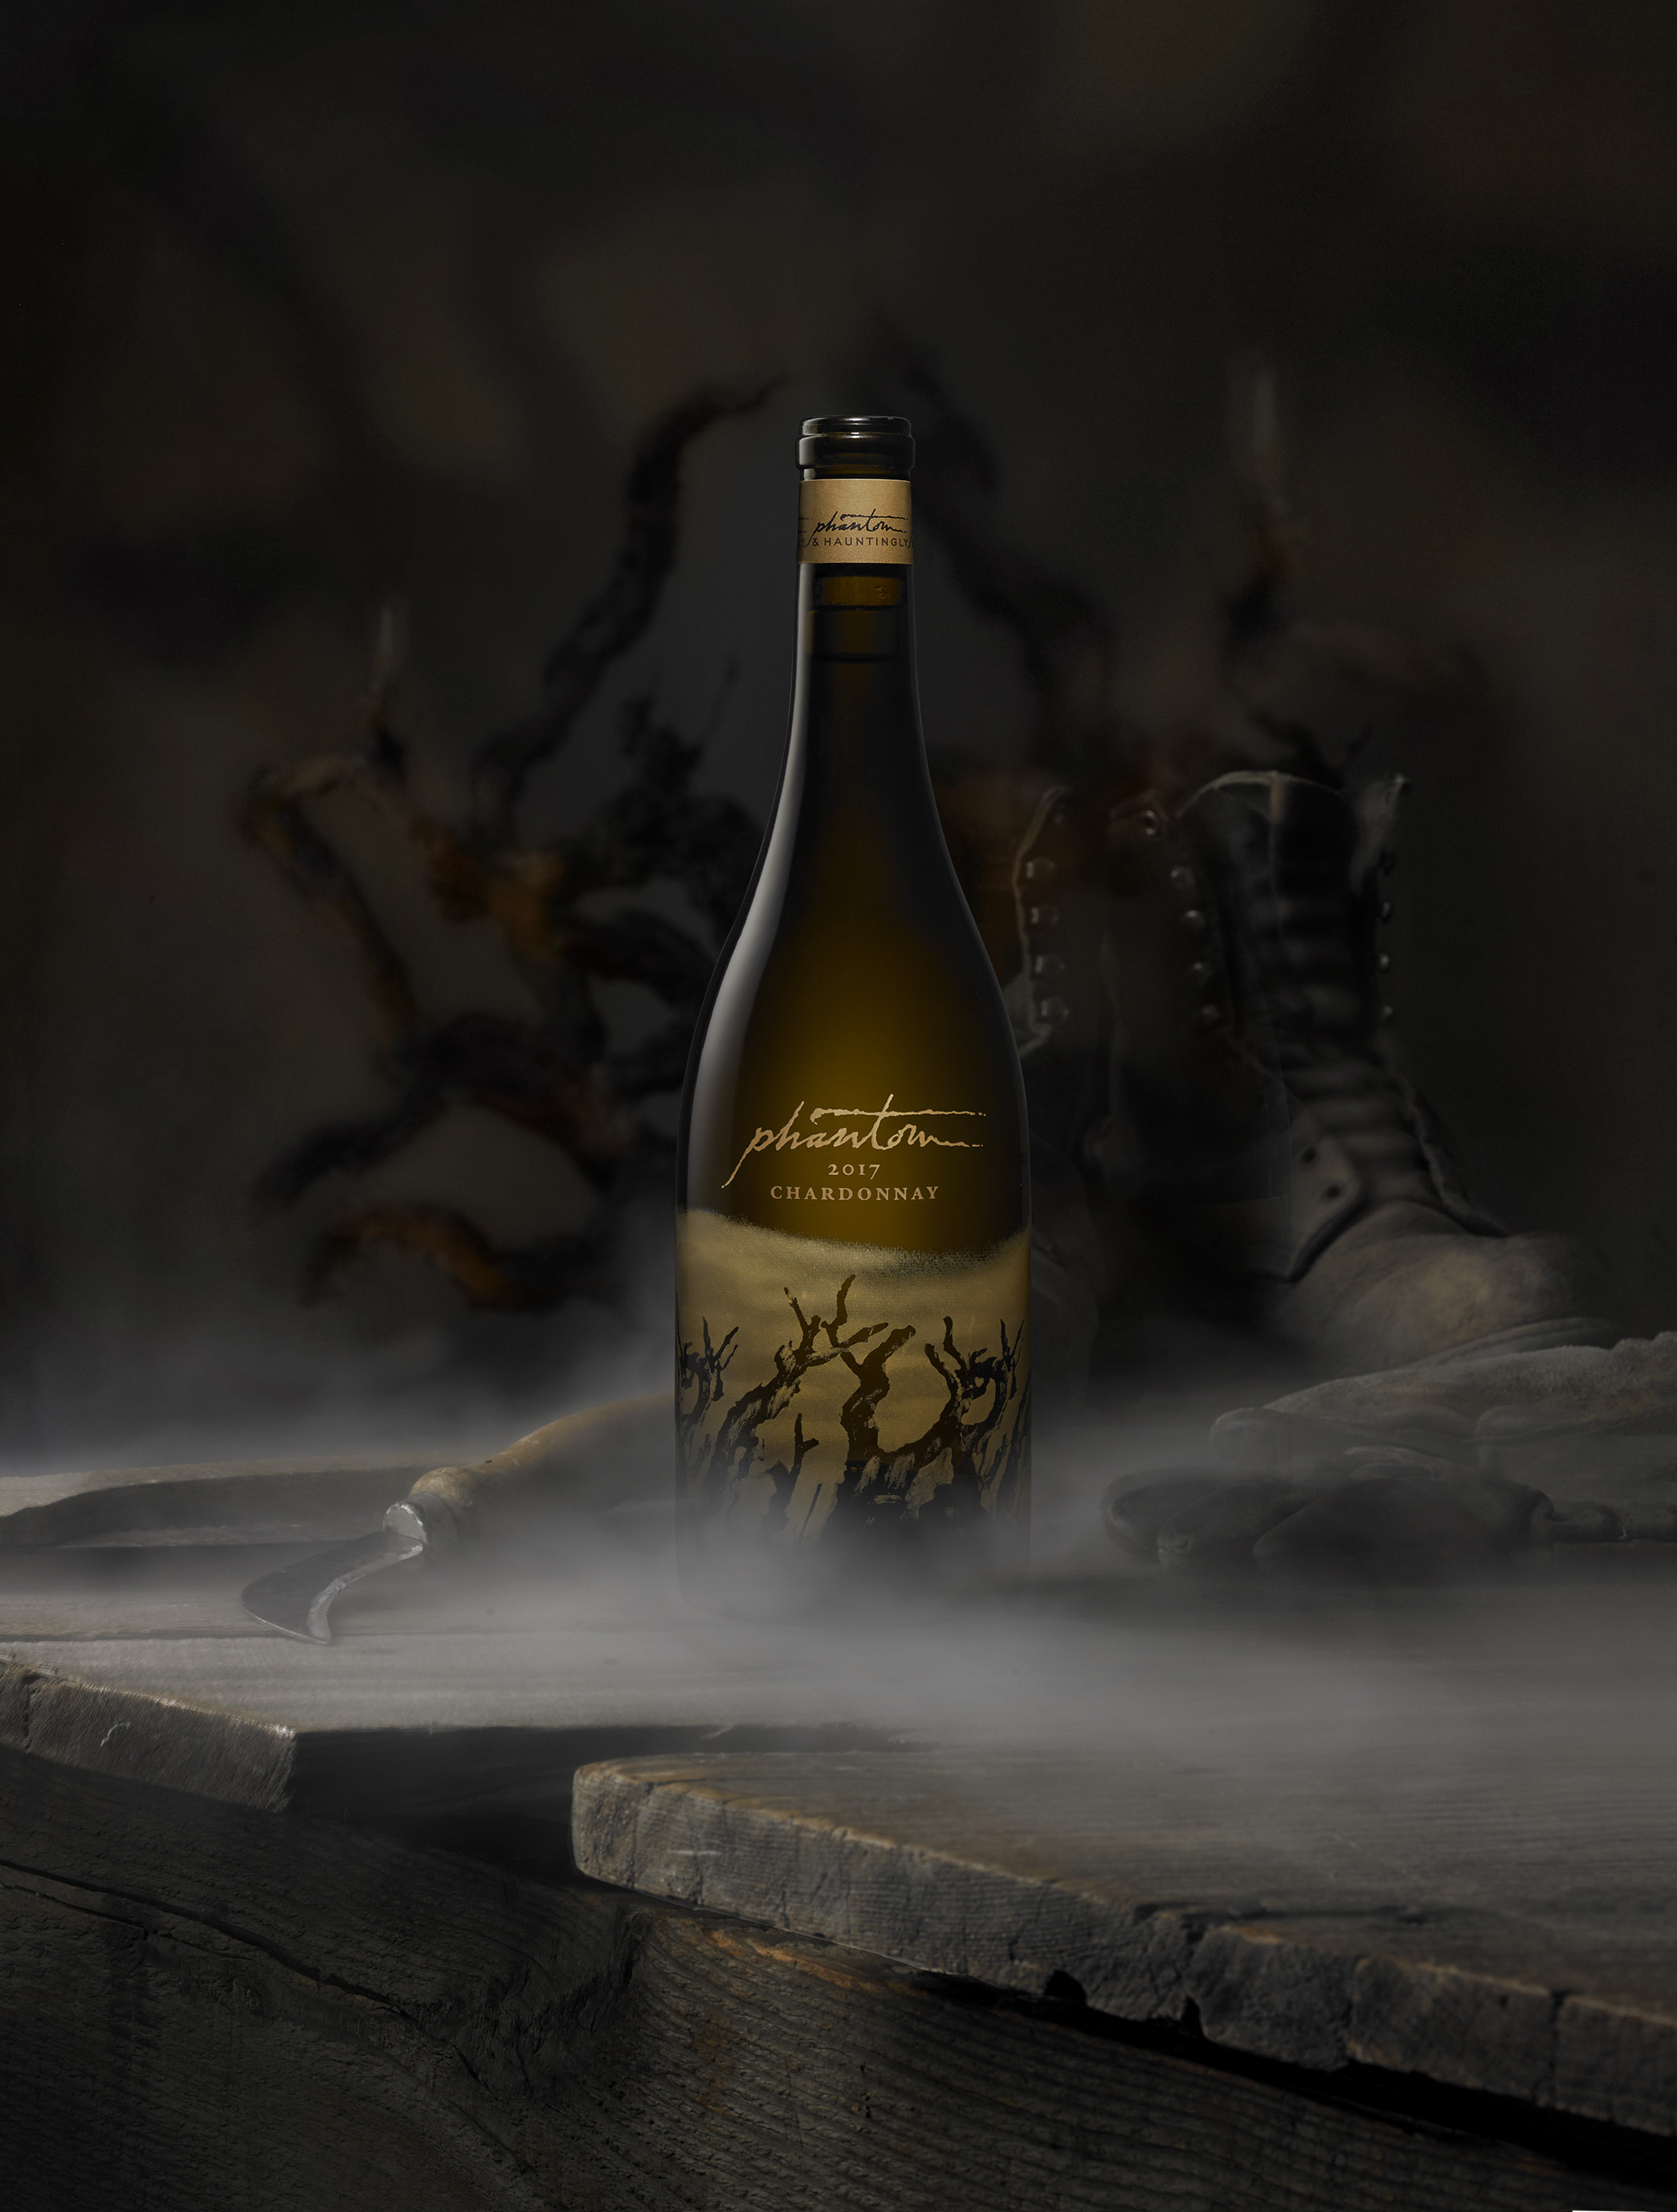 2017 Phantom Chardonnay High Res